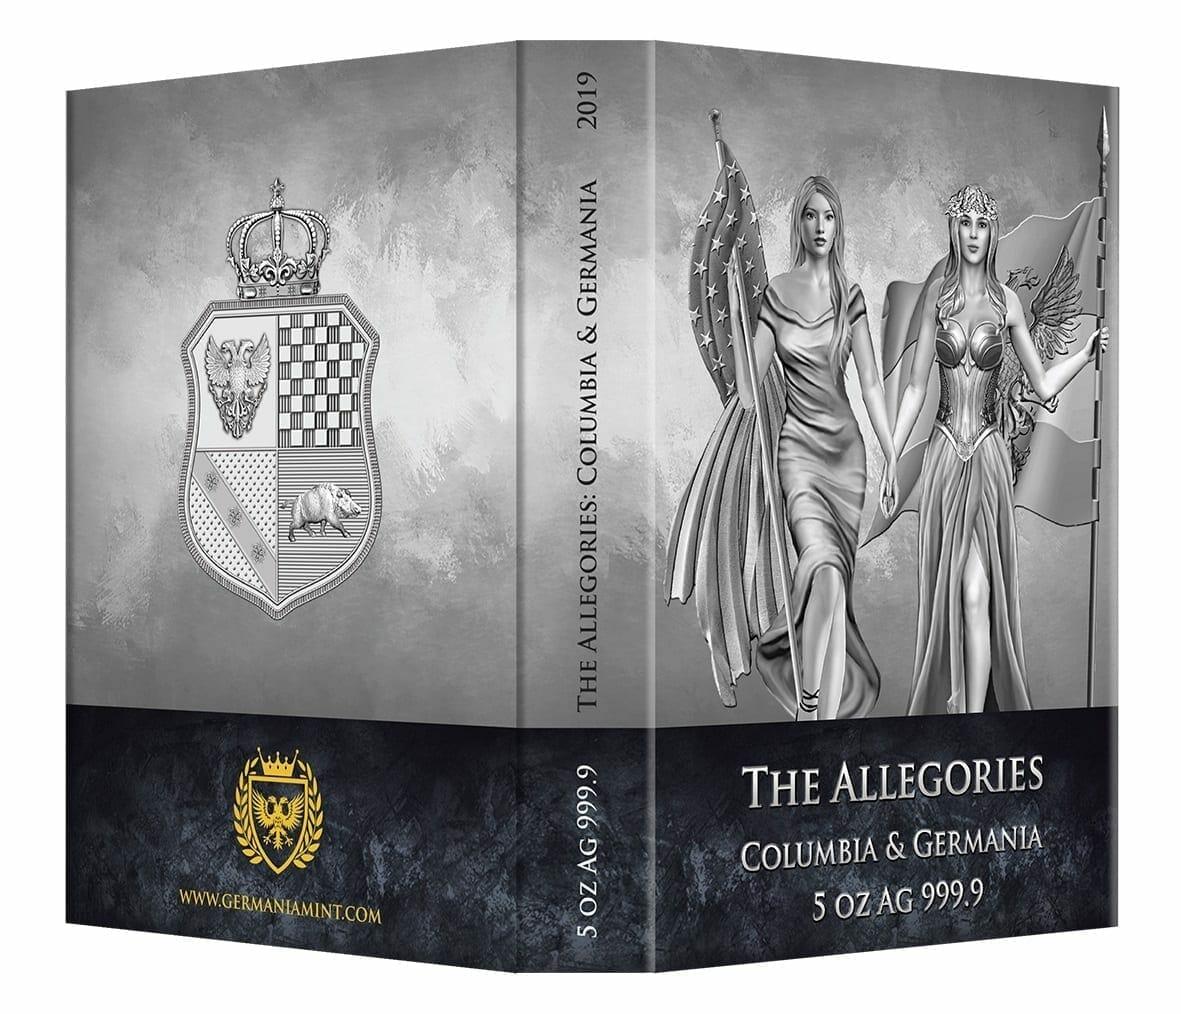 2019 The Allegories - Columbia & Germania 5oz .9999 Silver Coin 5